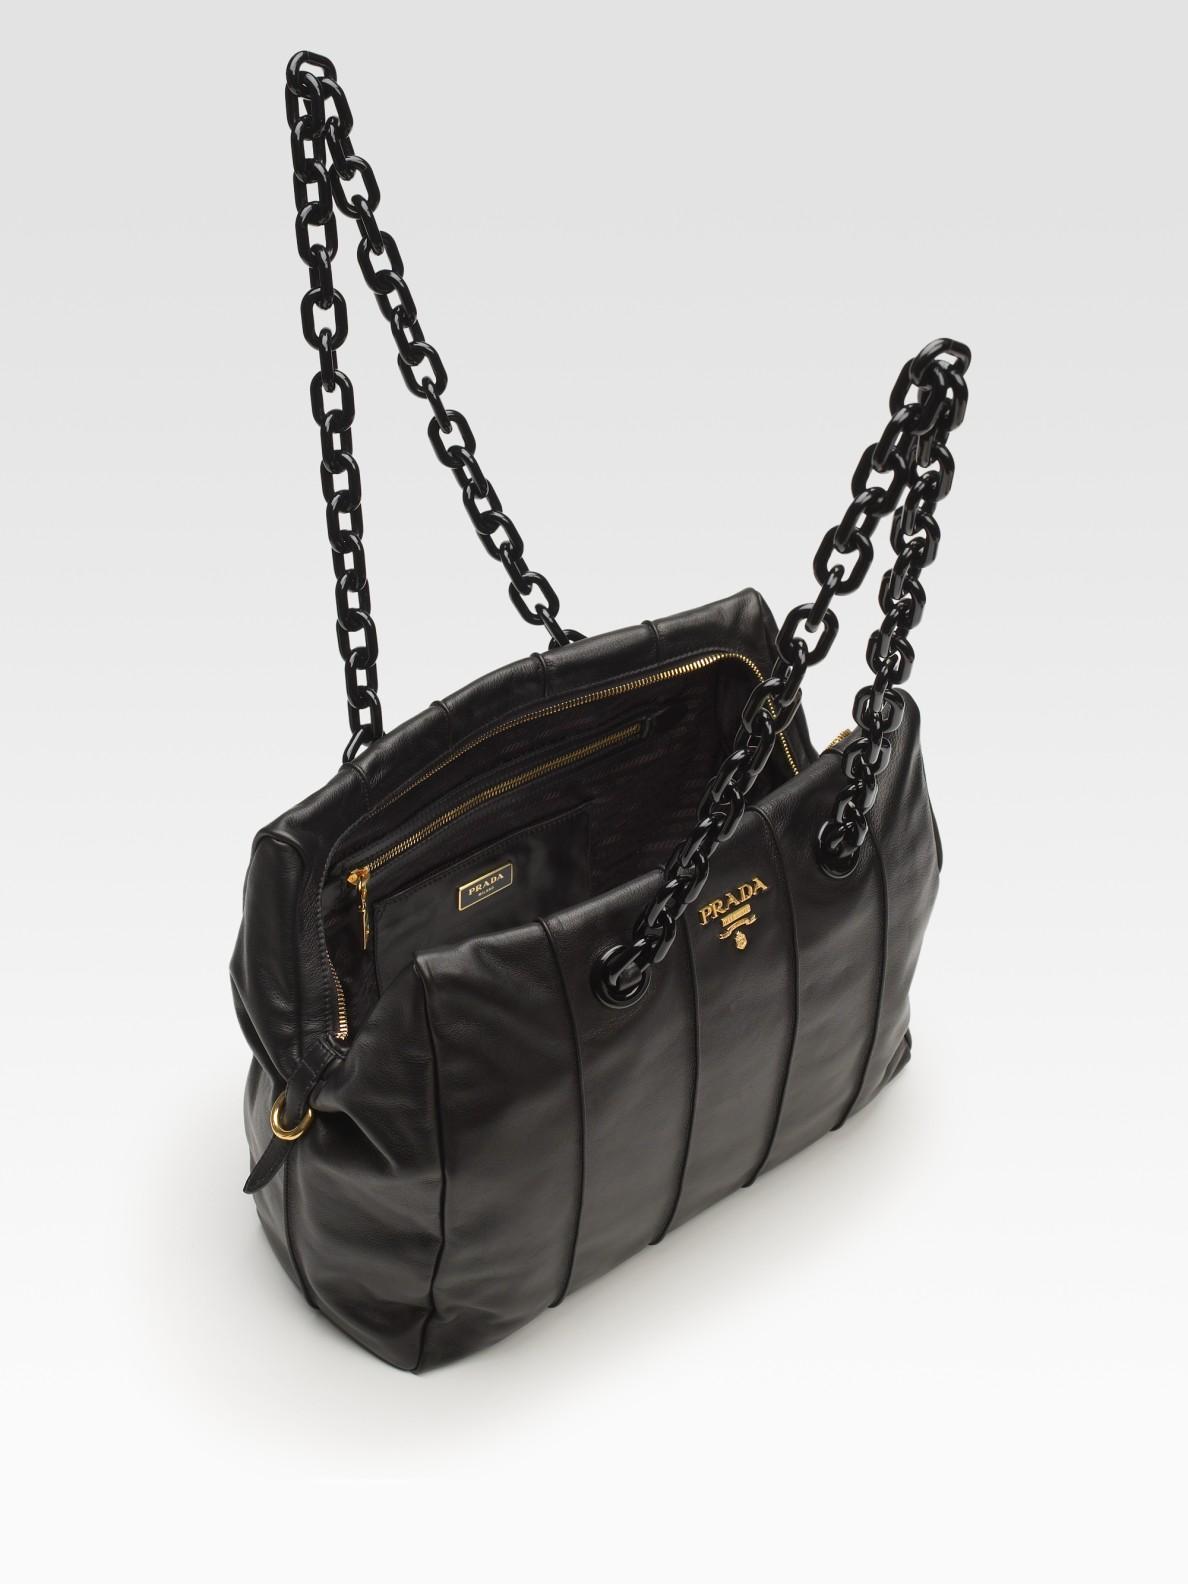 Prada Soft Calf Chain Bag in Black | Lyst